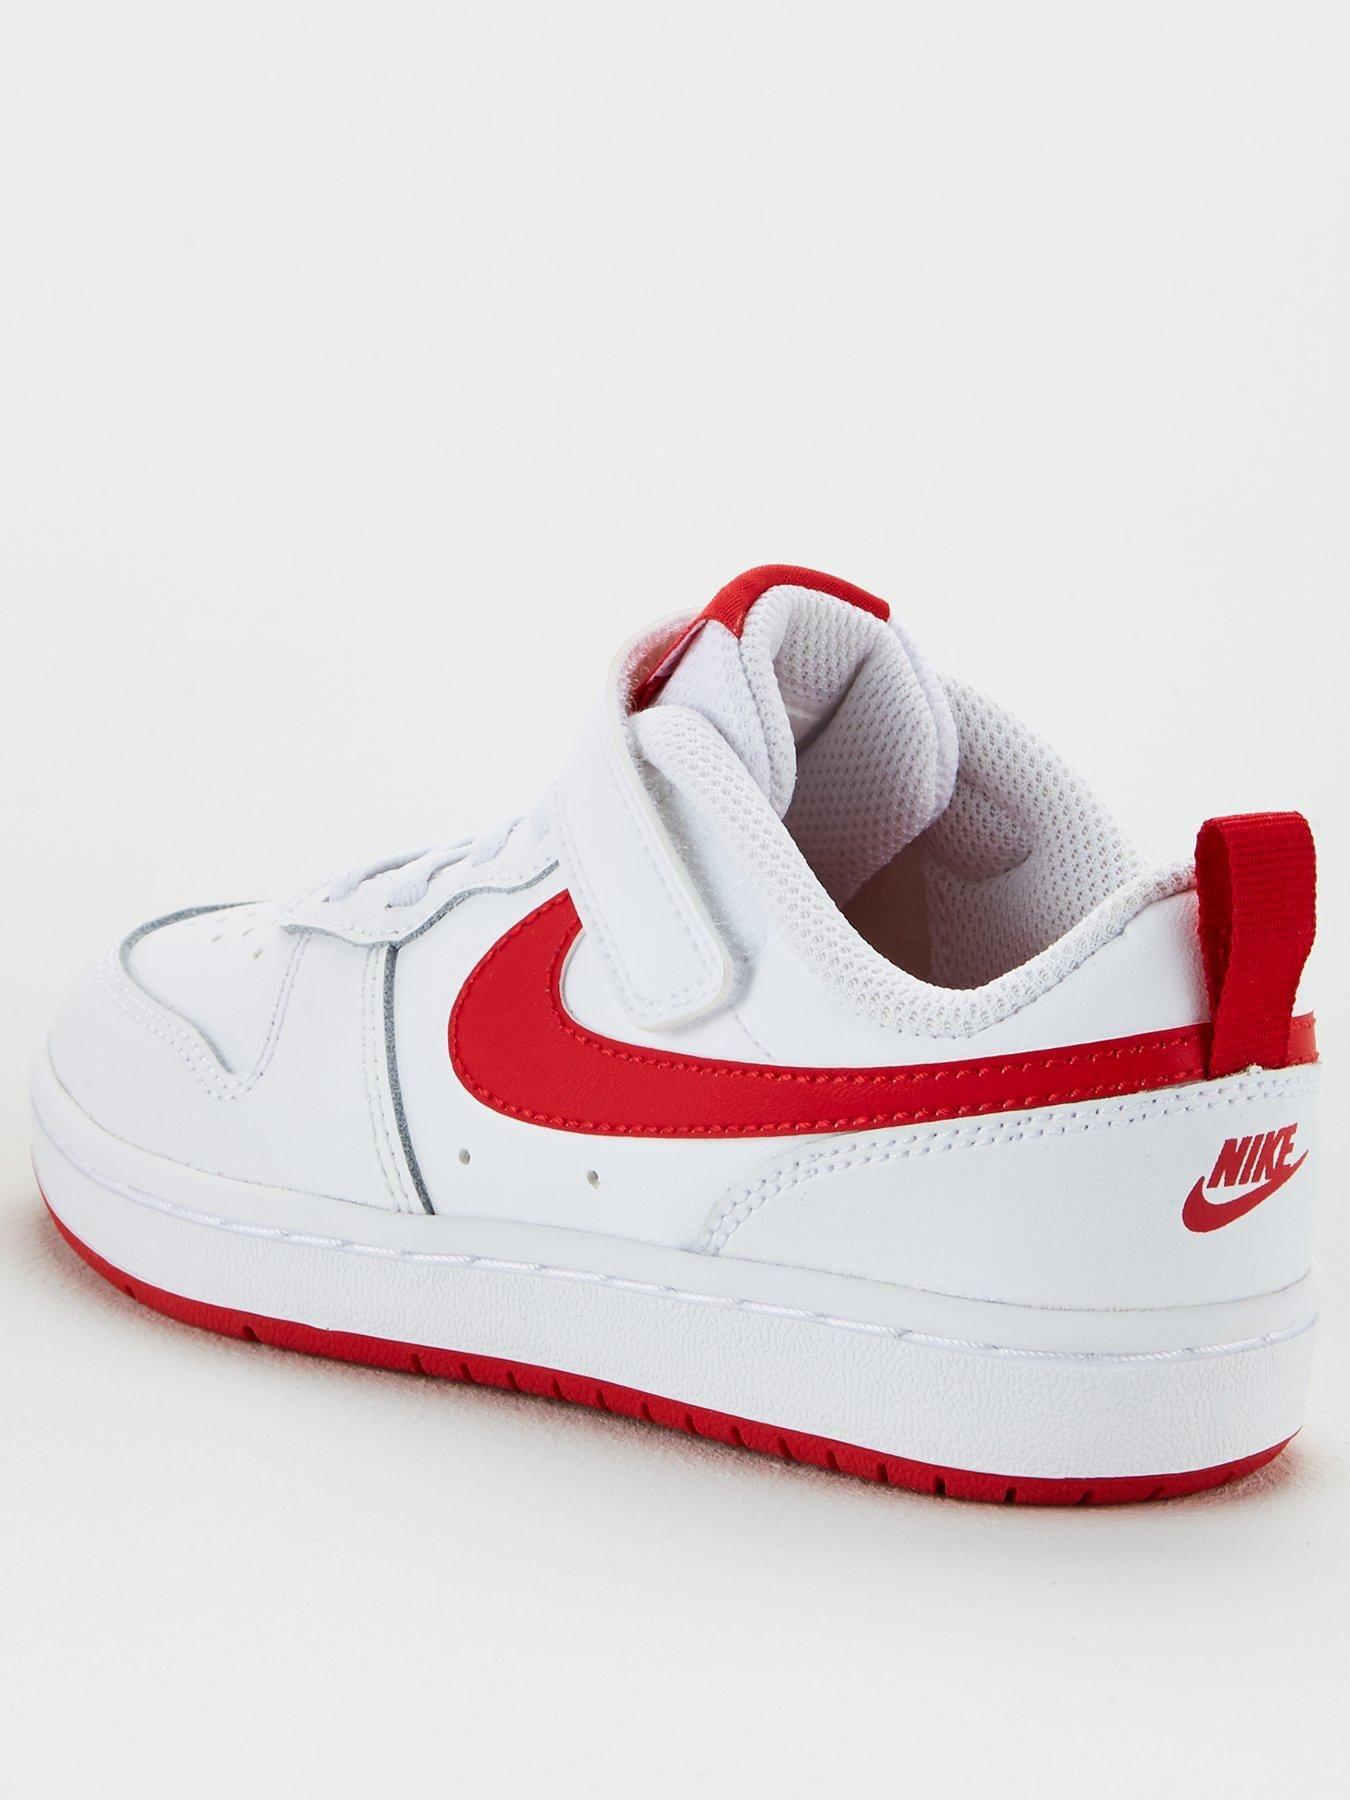 Nike Court Borough Low 2 Childrens